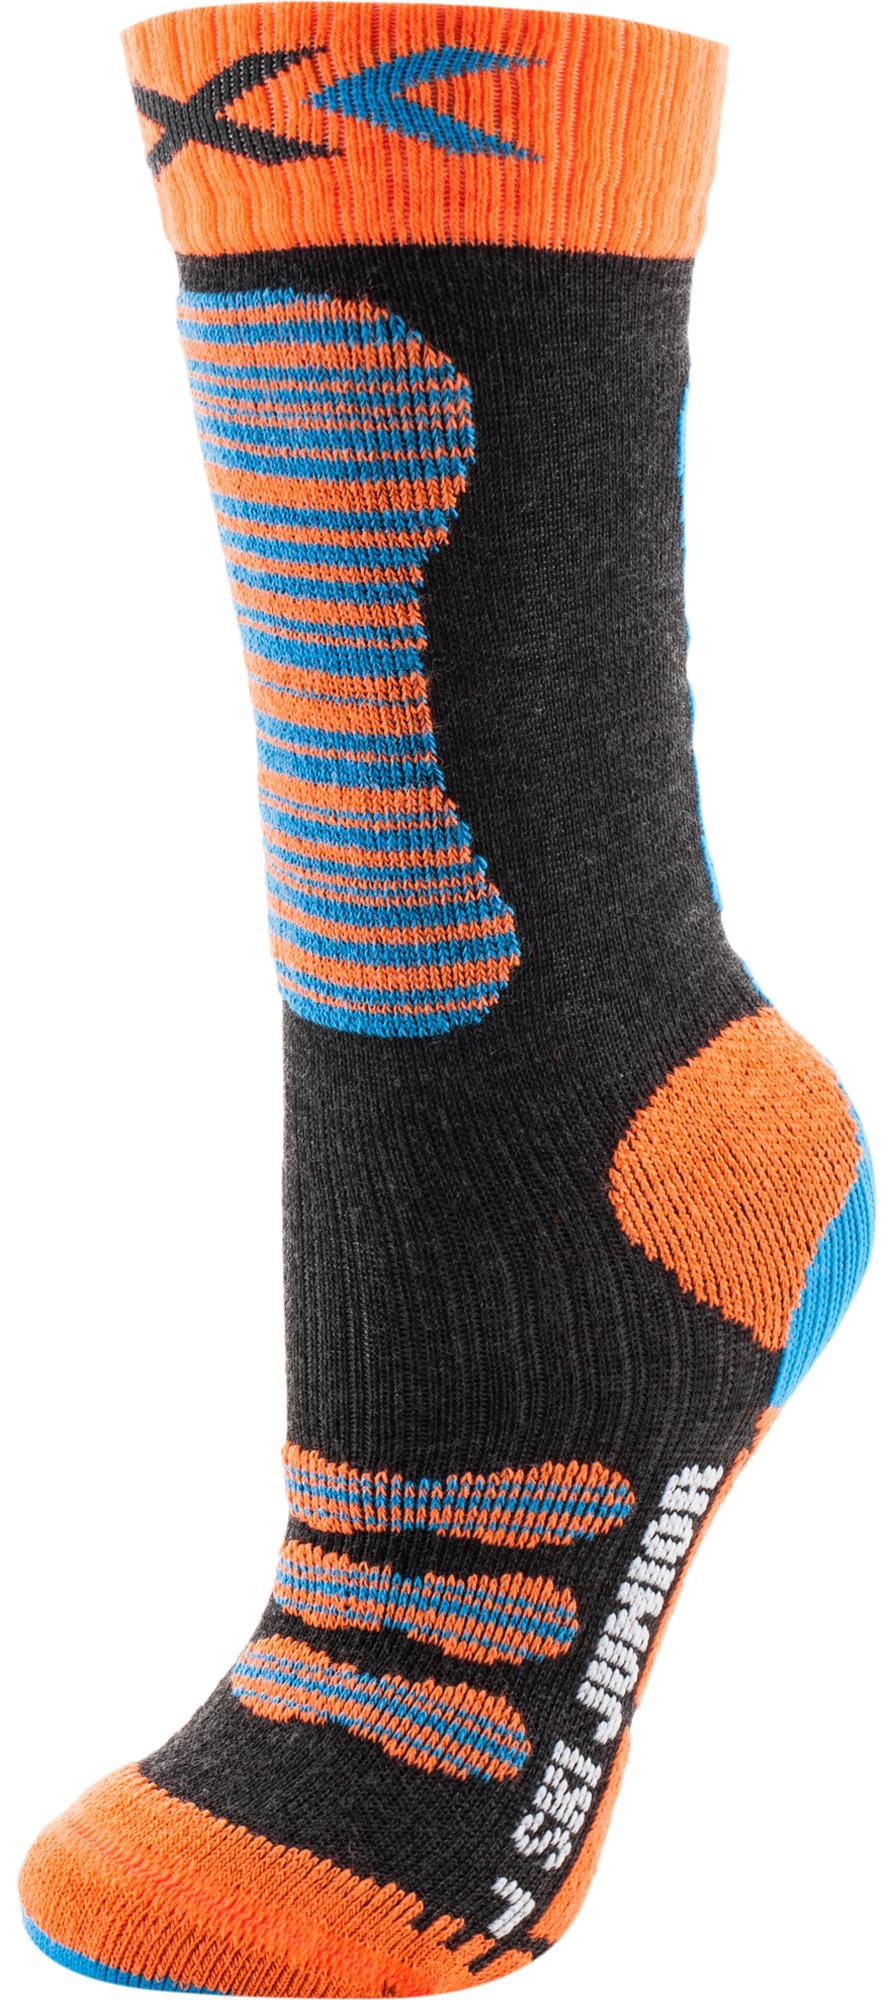 X-Socks Гольфы детские X-Socks, 1пара